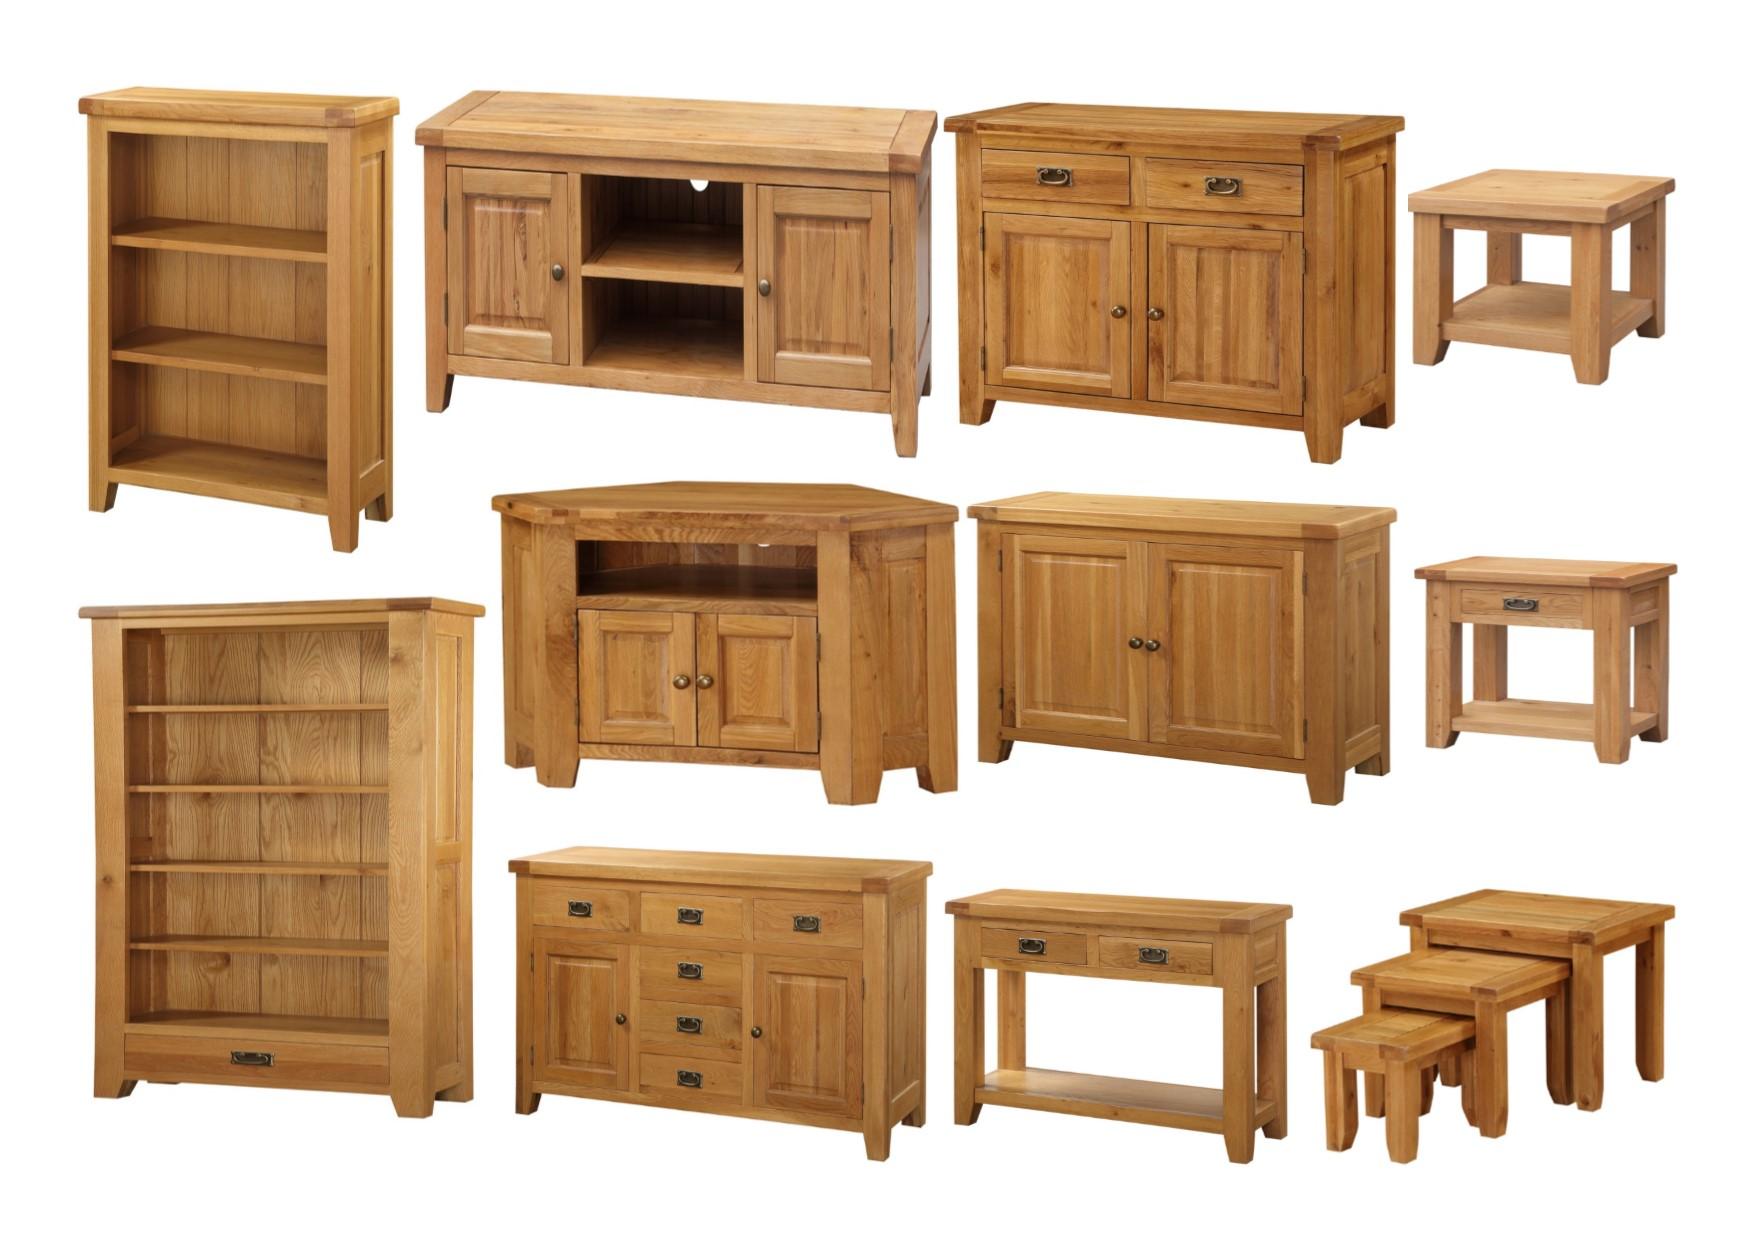 Heartlands acorn solid oak living room furniture storage tables tv units for Oak shelving units living room